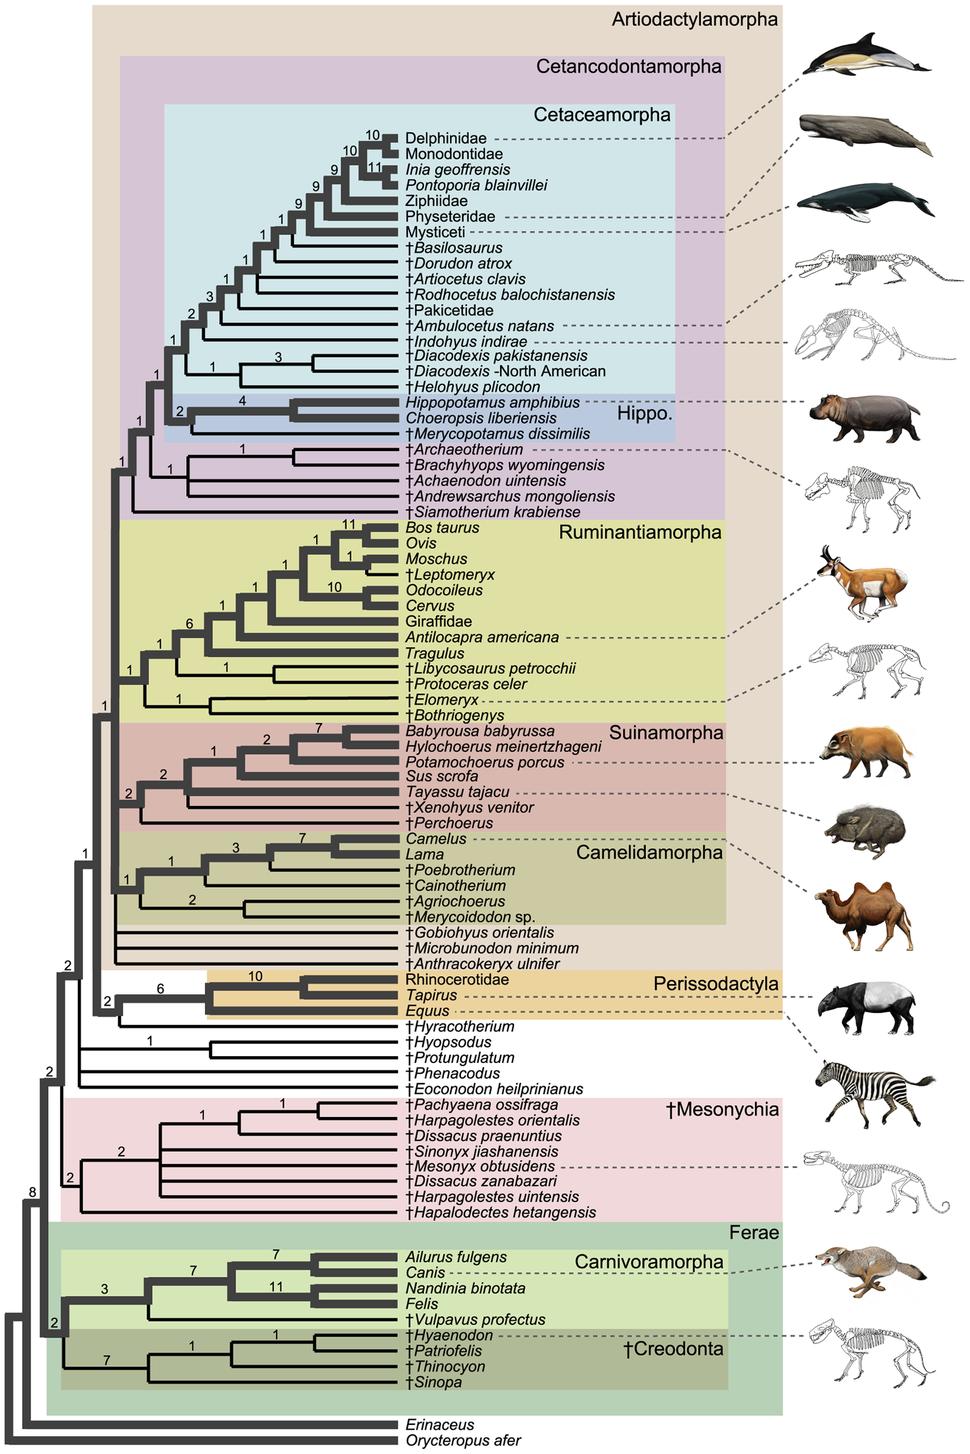 Cladogram of Cetacea within Artiodactyla